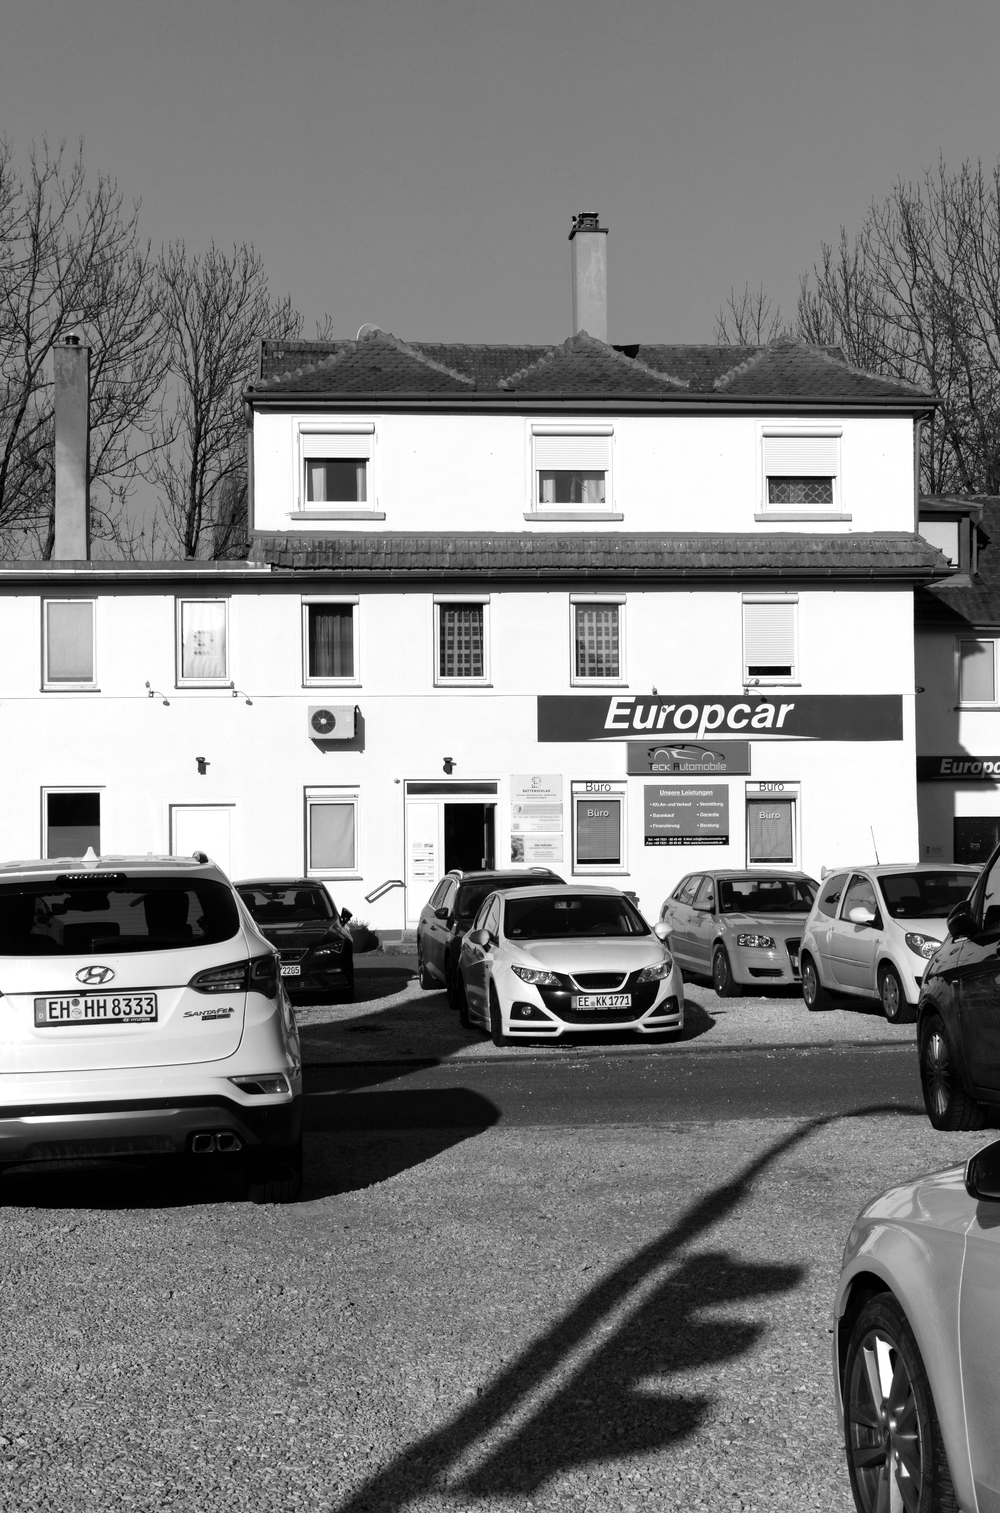 staging area - photography, cars - marcushammerschmitt | ello